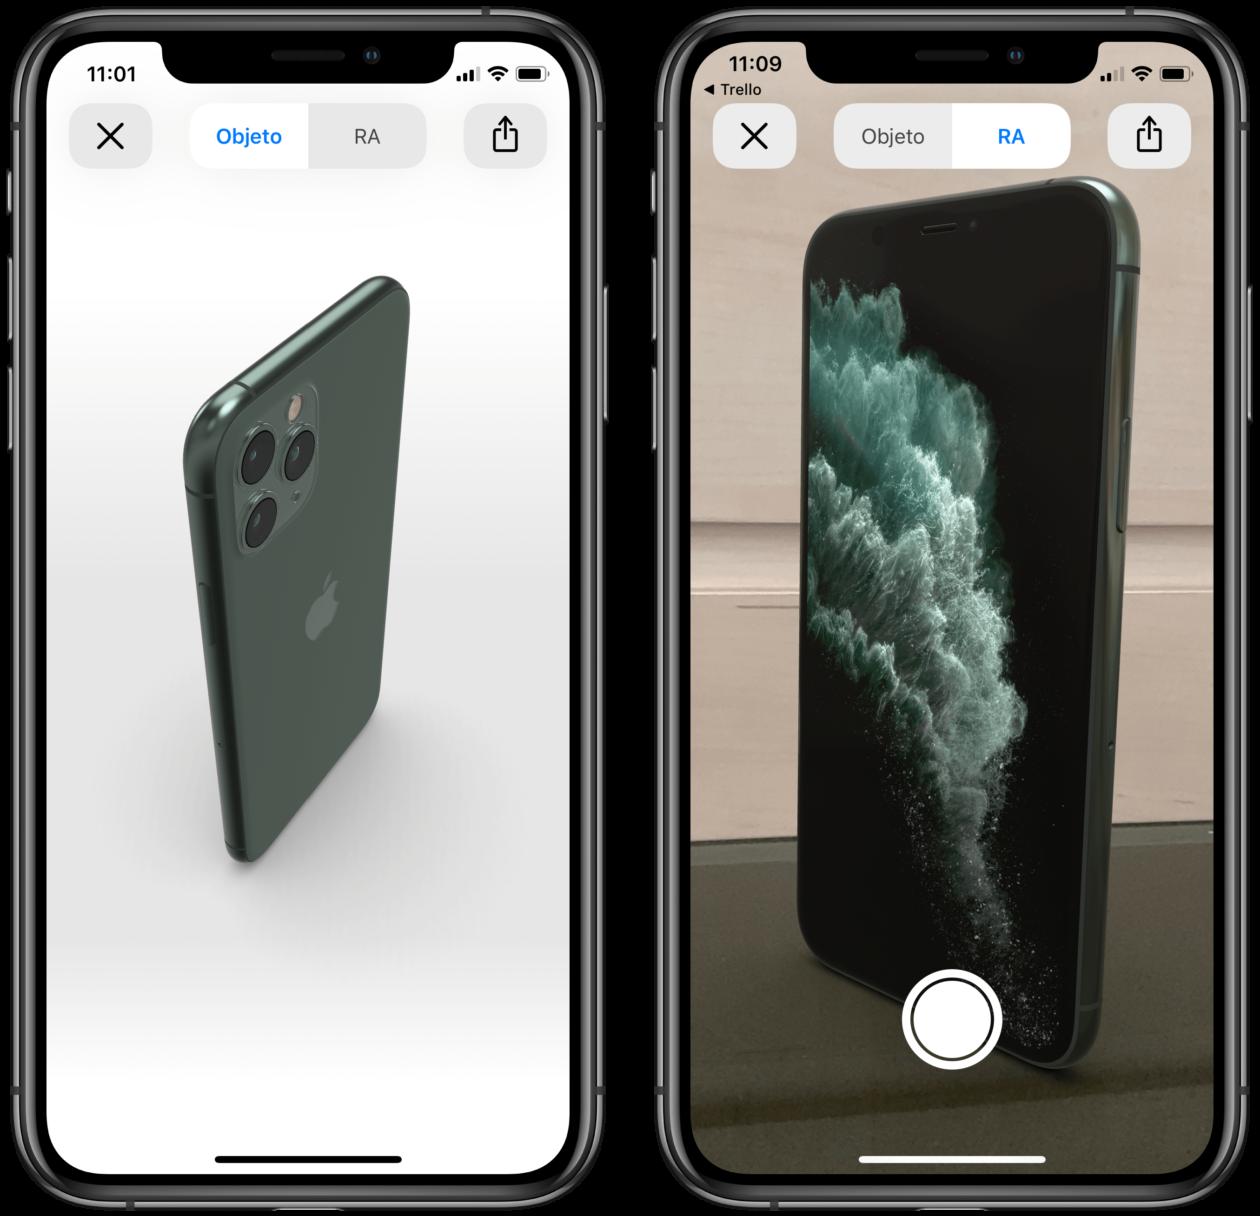 iPhone 11 Pro on AR